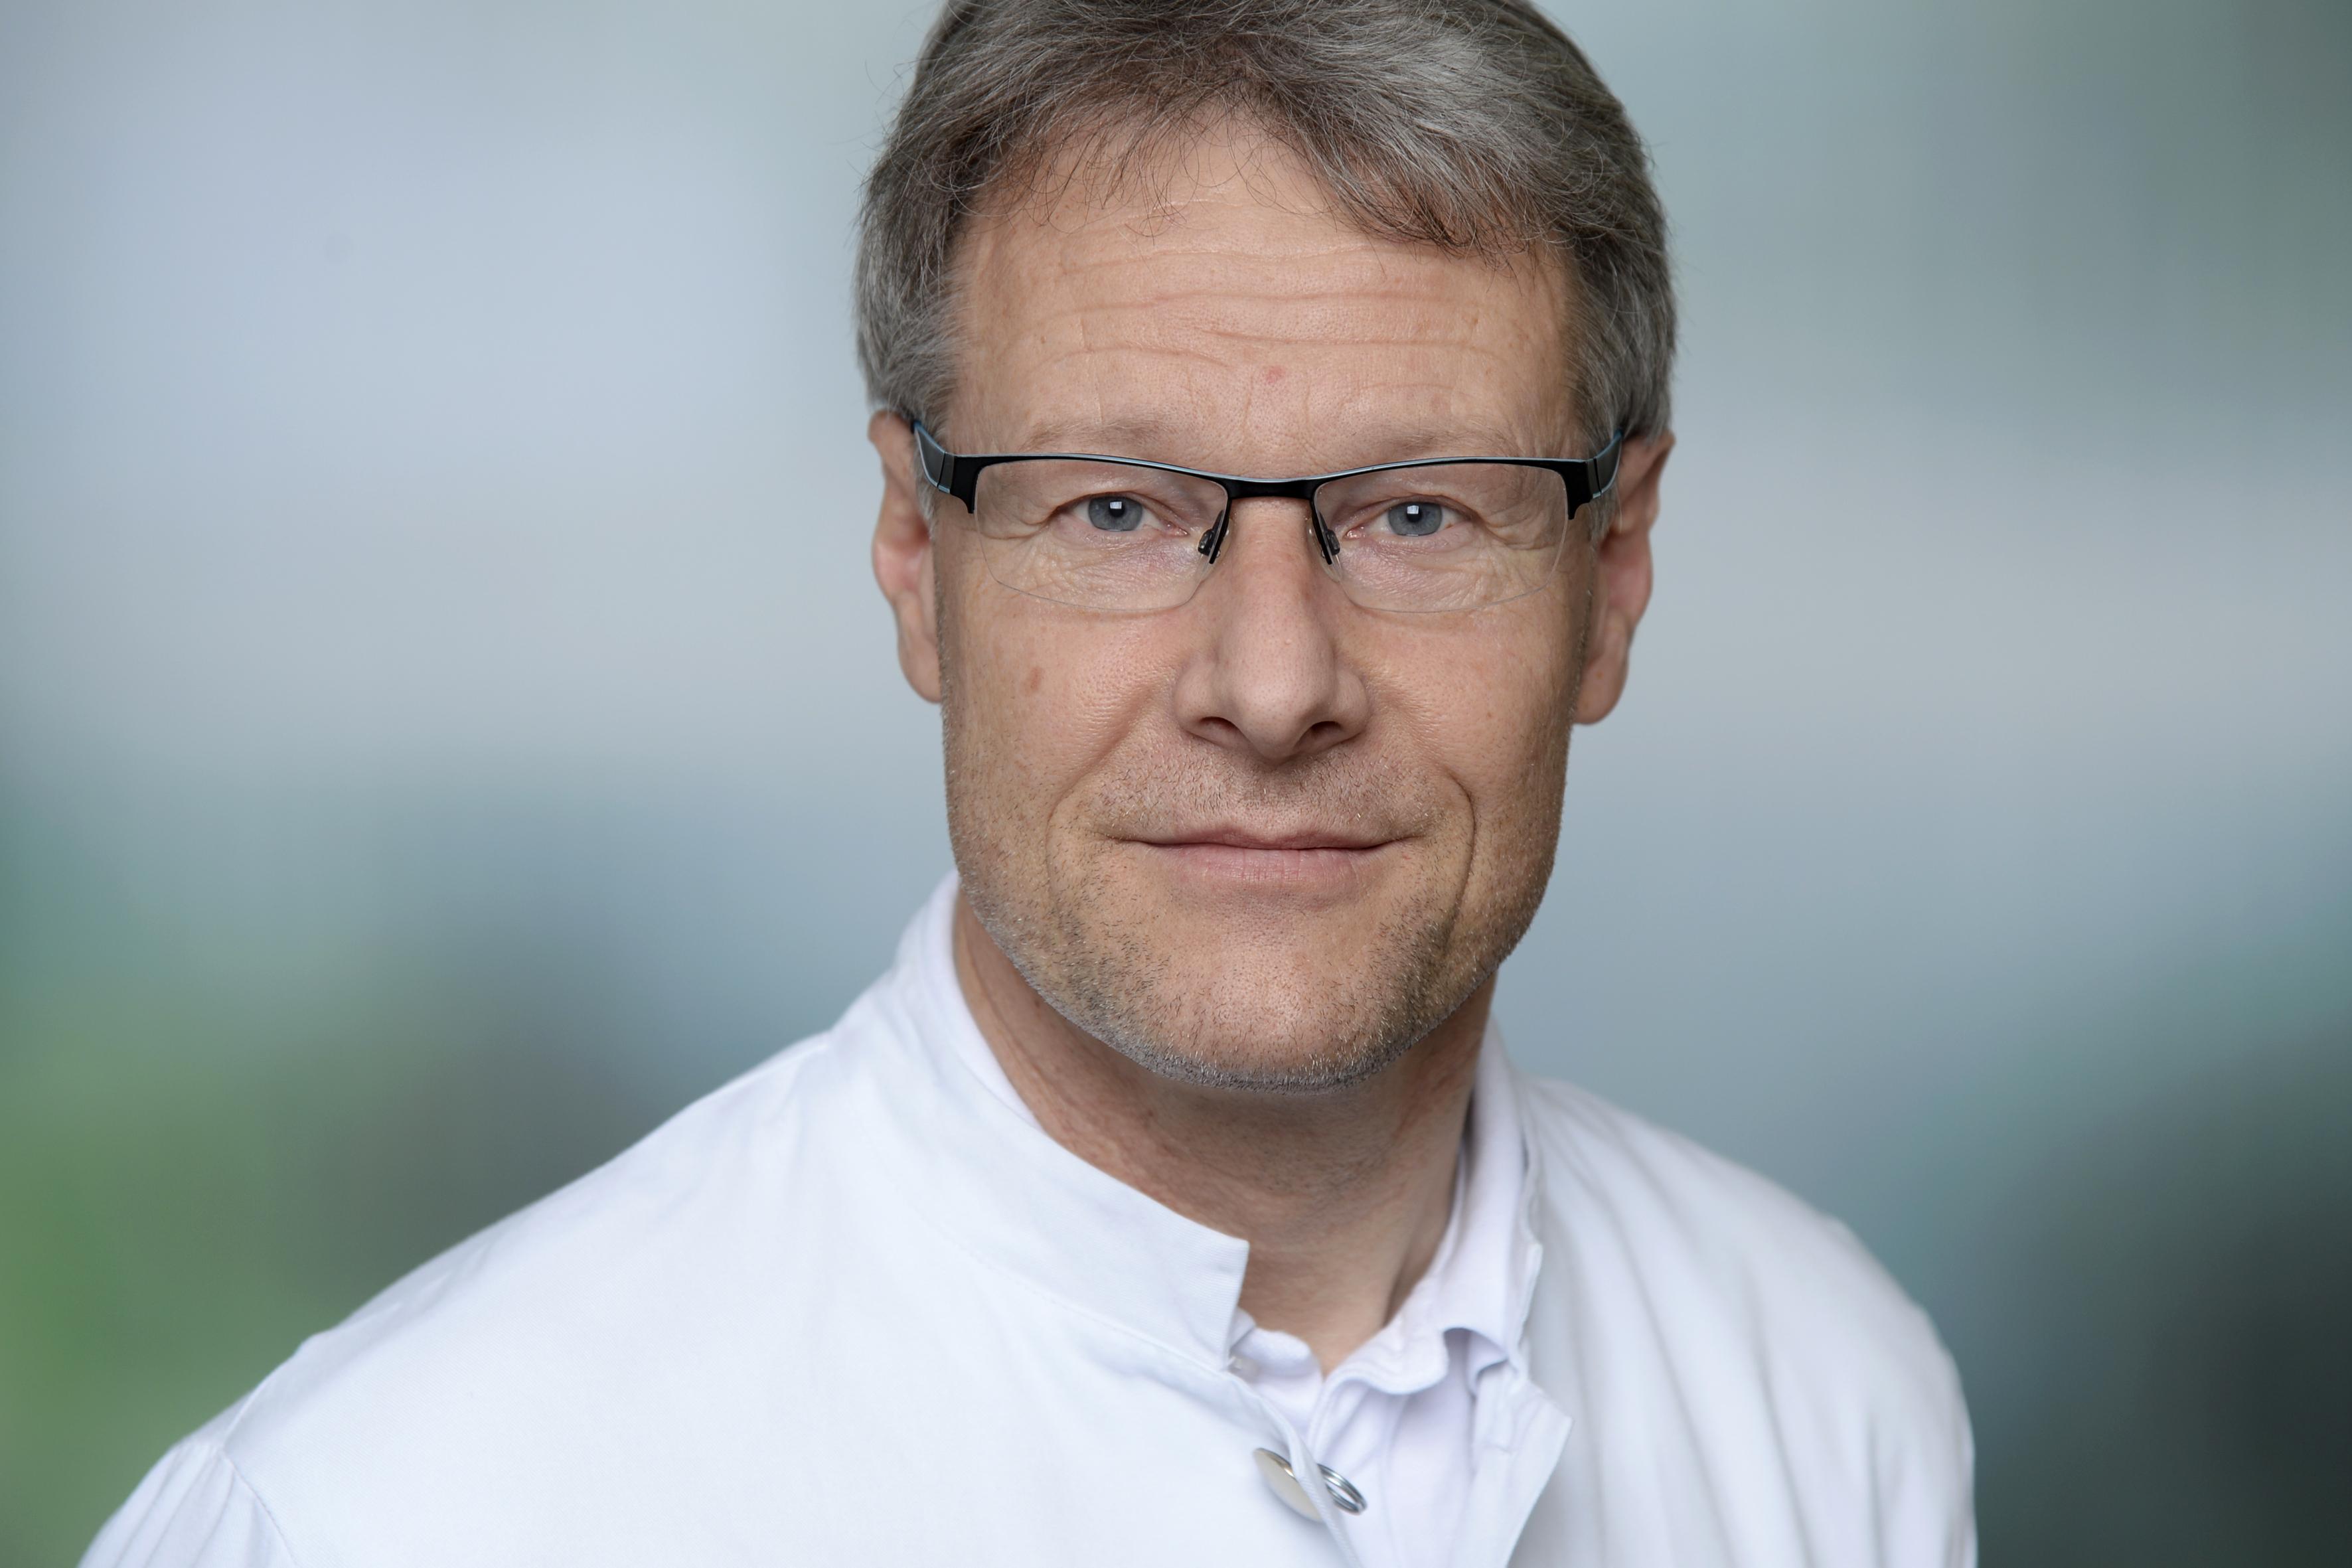 asklepios -Dr. Jürgen Linzer Chefarzt Nephrologie am Asklepios Klinikum Harburg